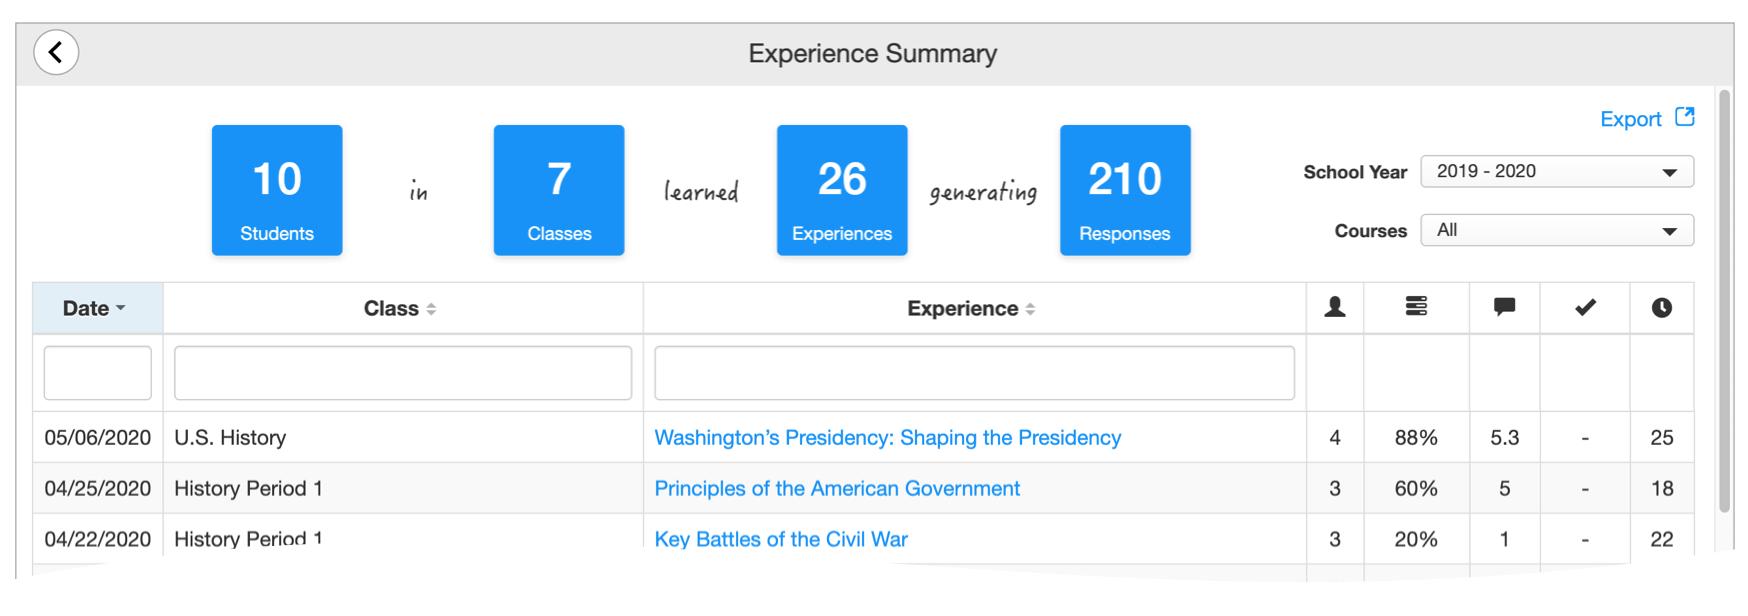 Experience Summary Report